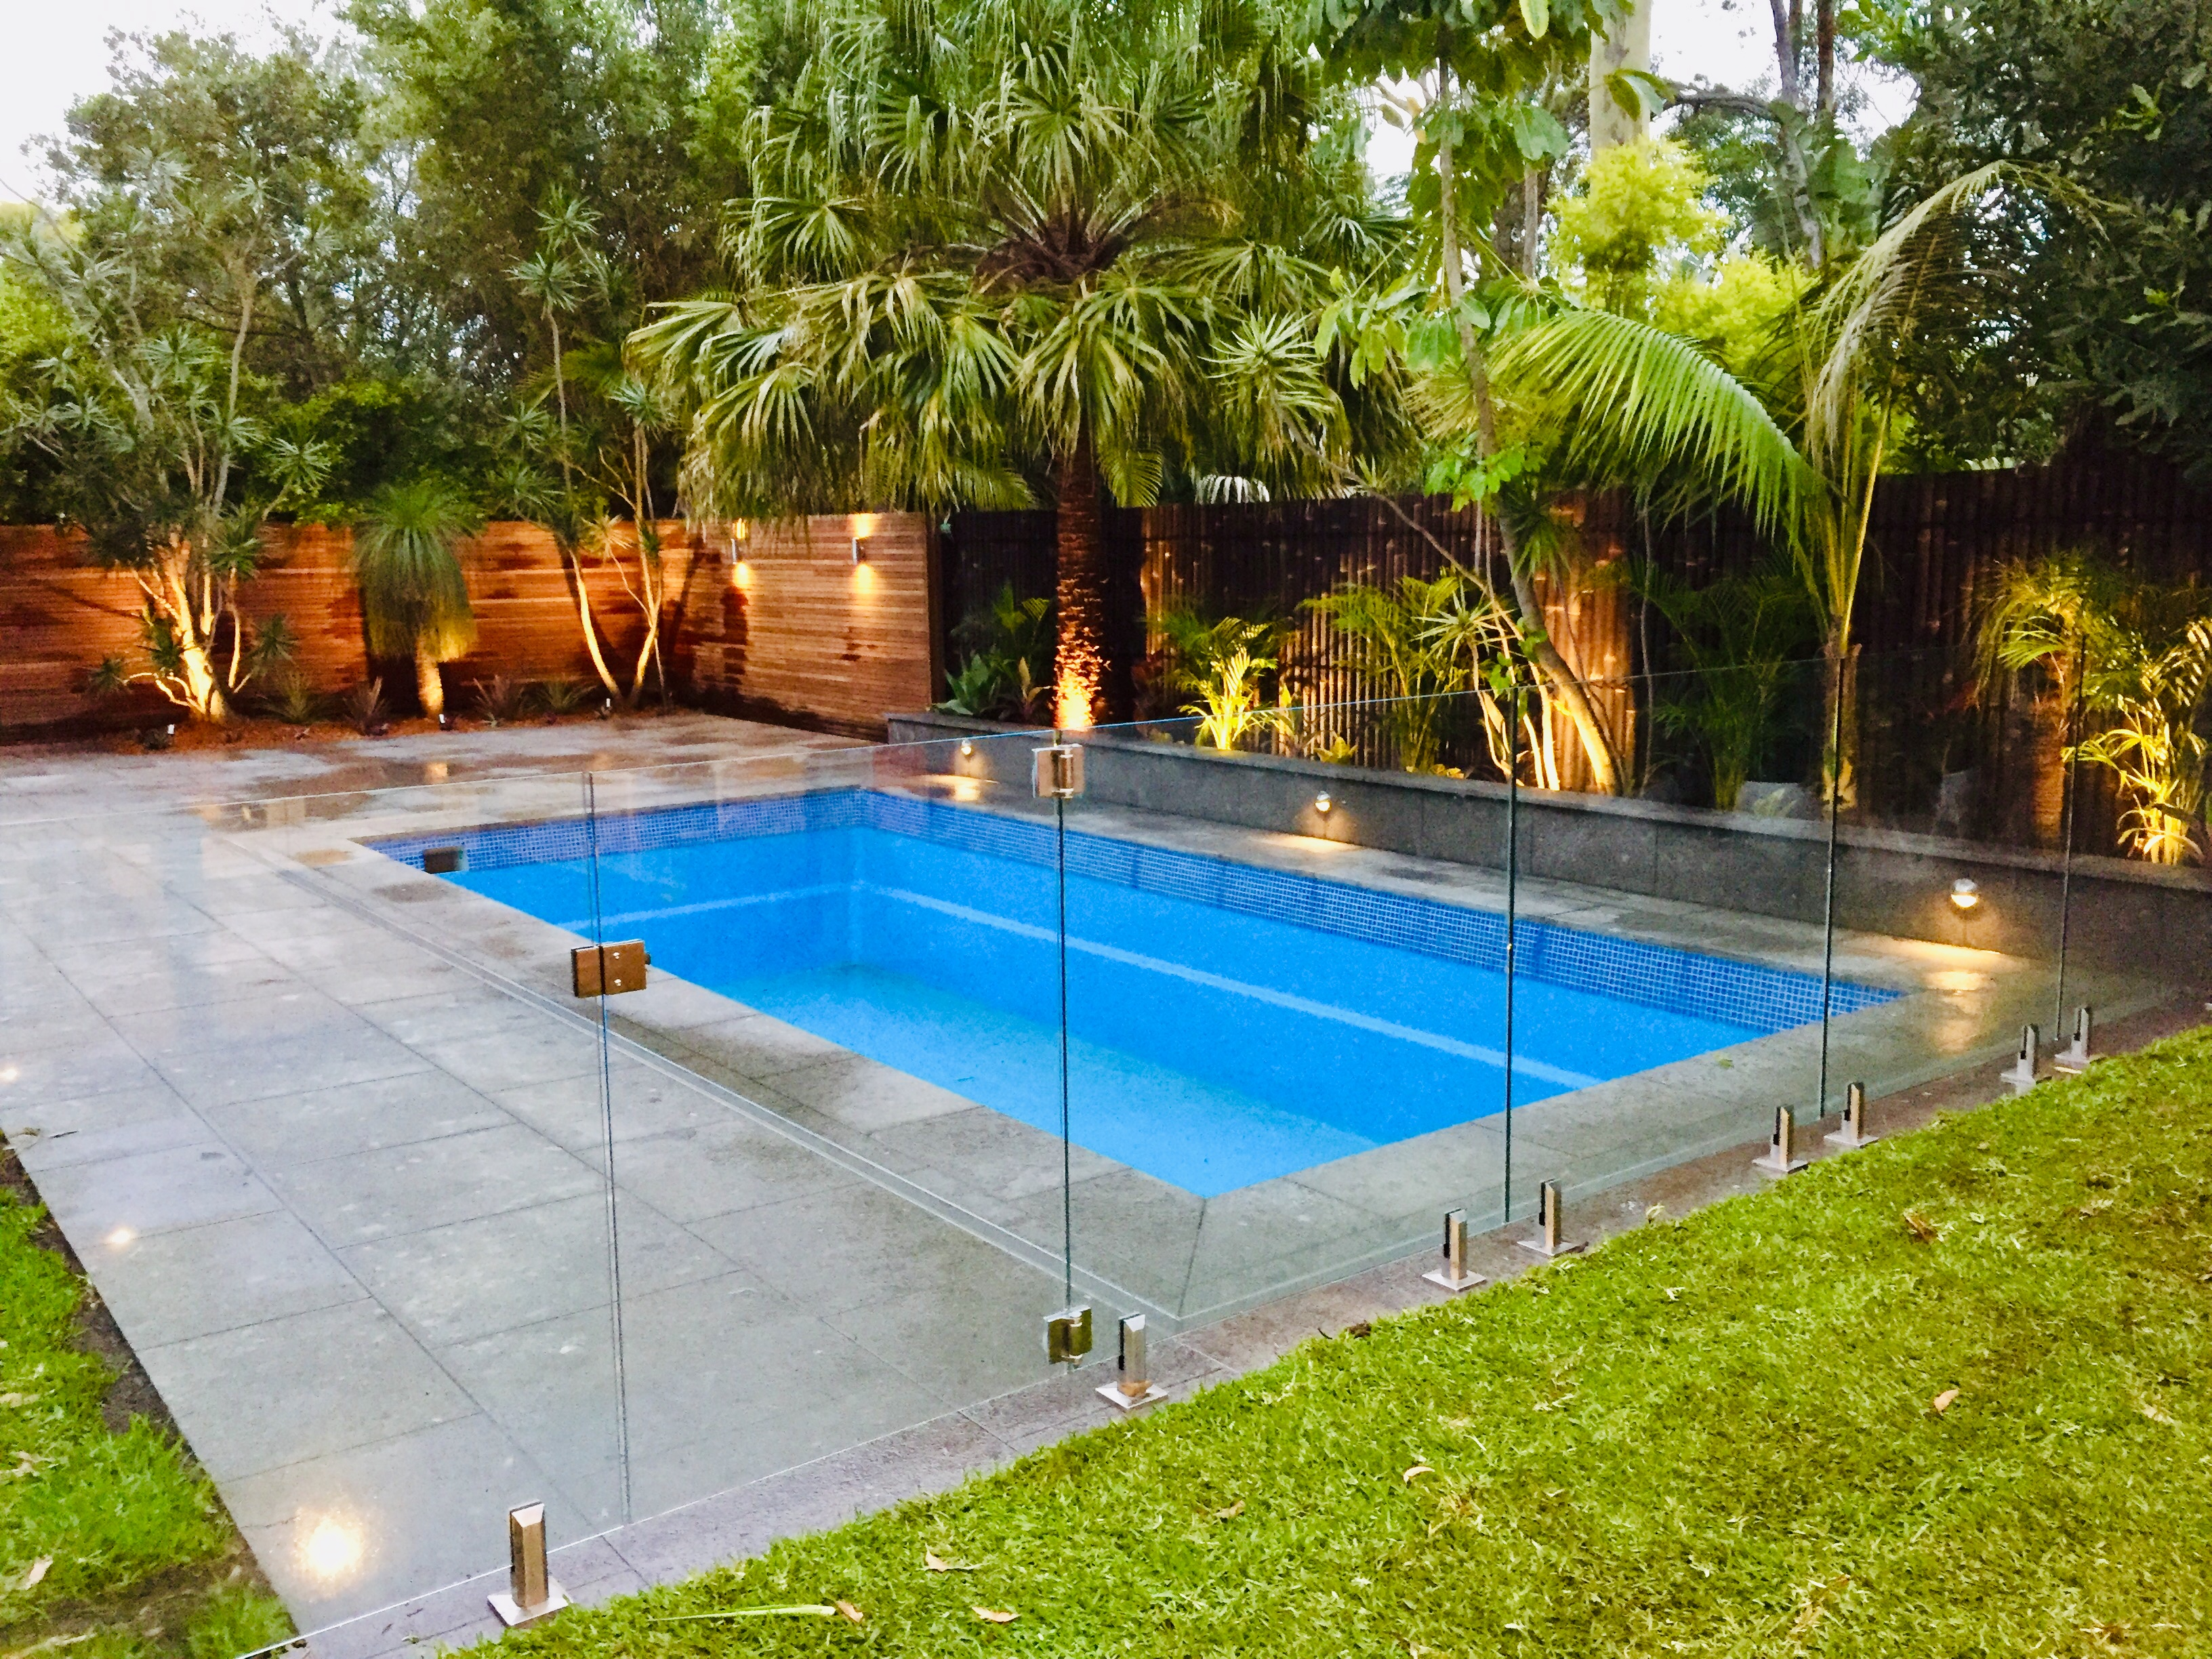 Pool Renovation - Paving - Glass Fence -